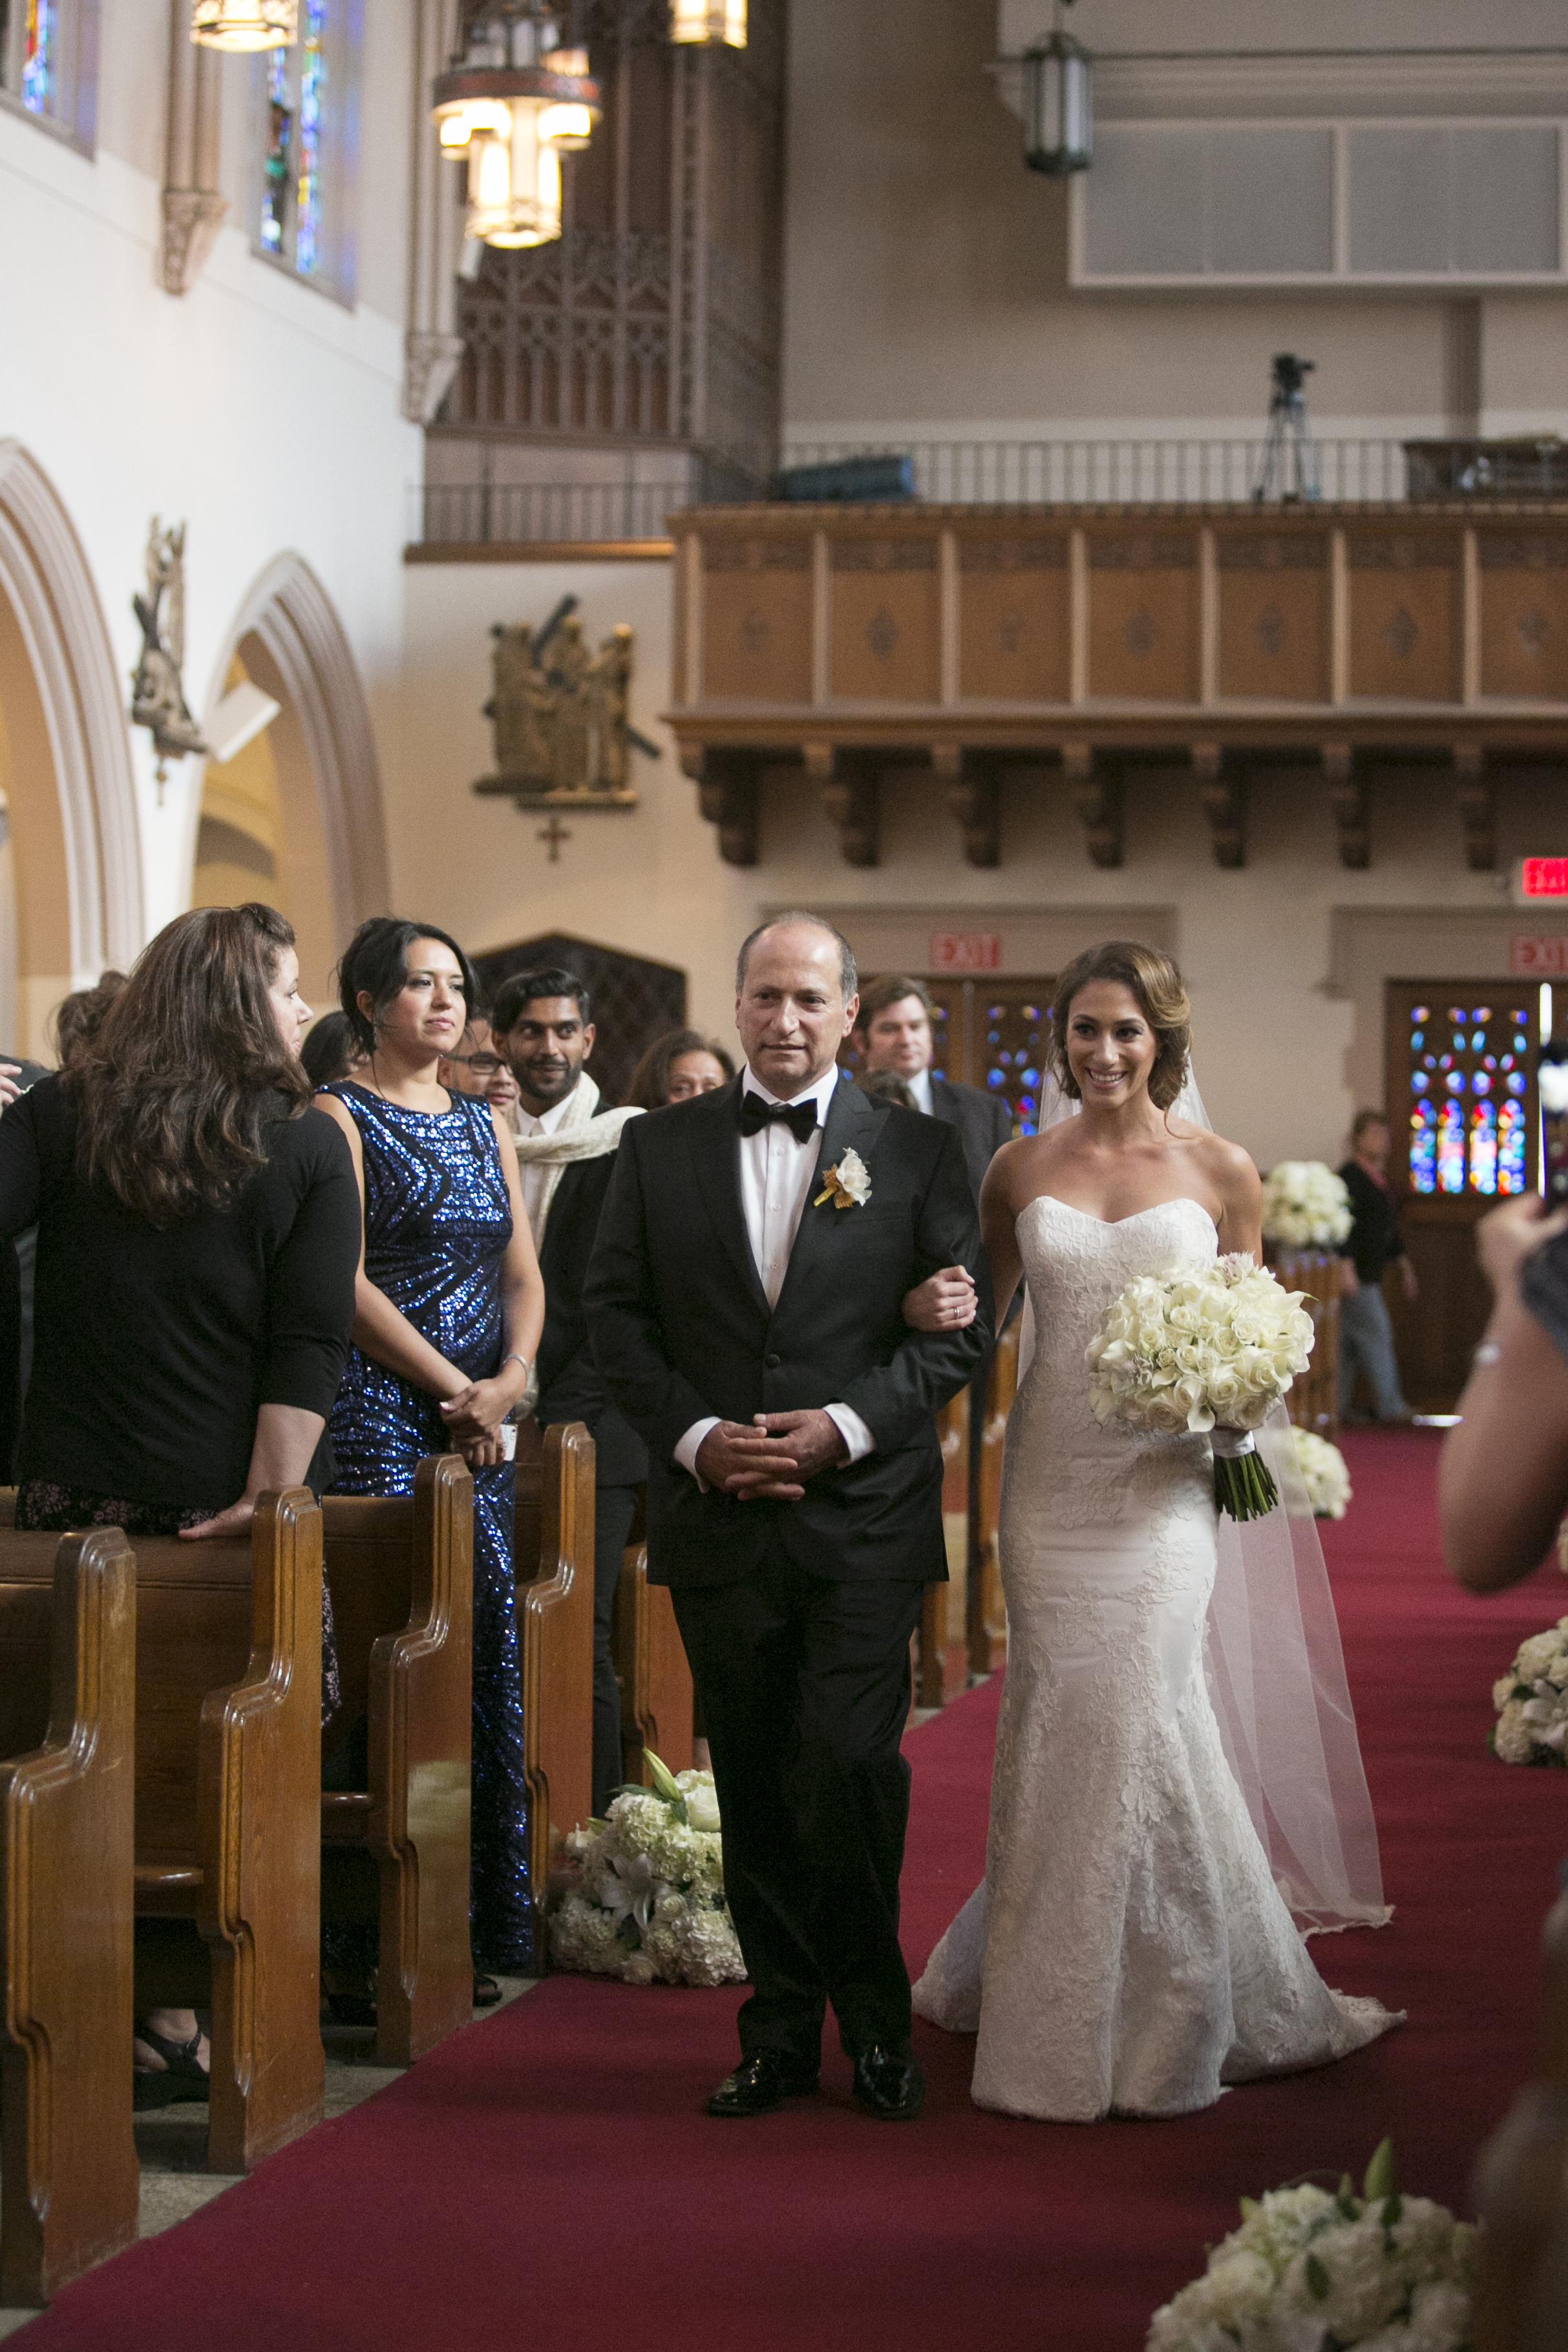 Persian Wedding-South San Francisco-Meo Baaklini20.jpg